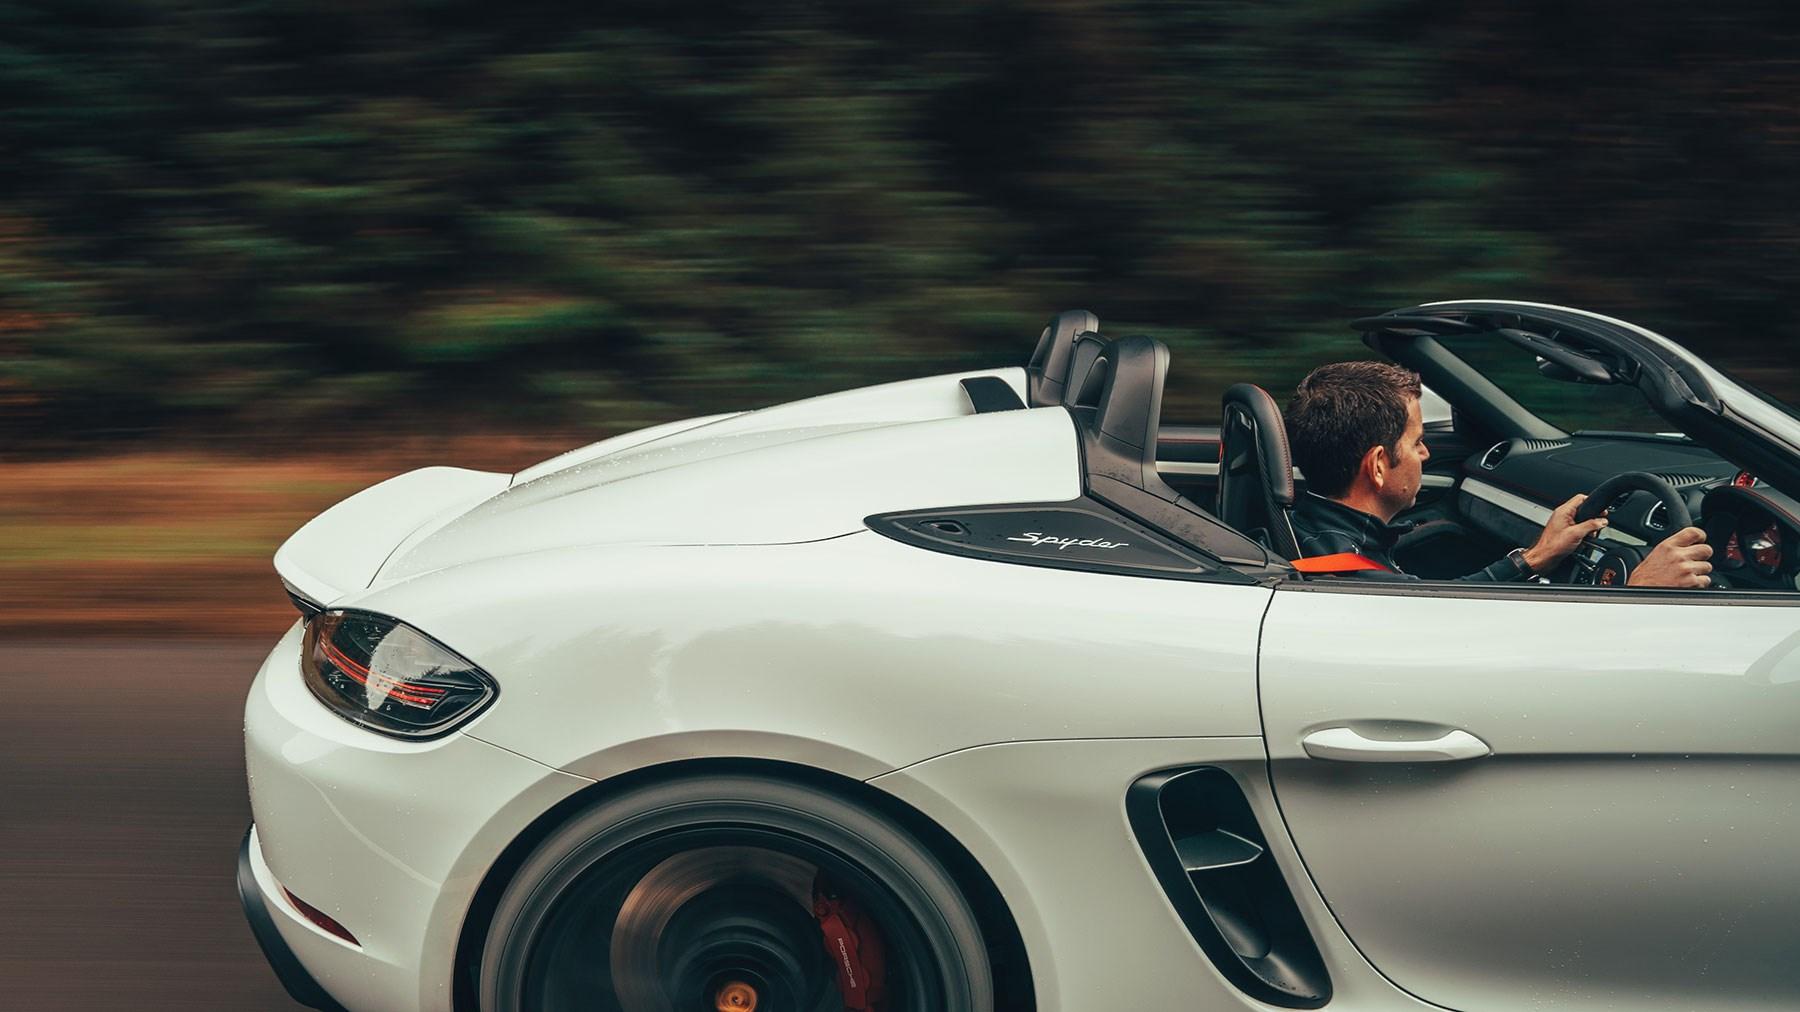 New 2019 Porsche 718 Boxster Spyder